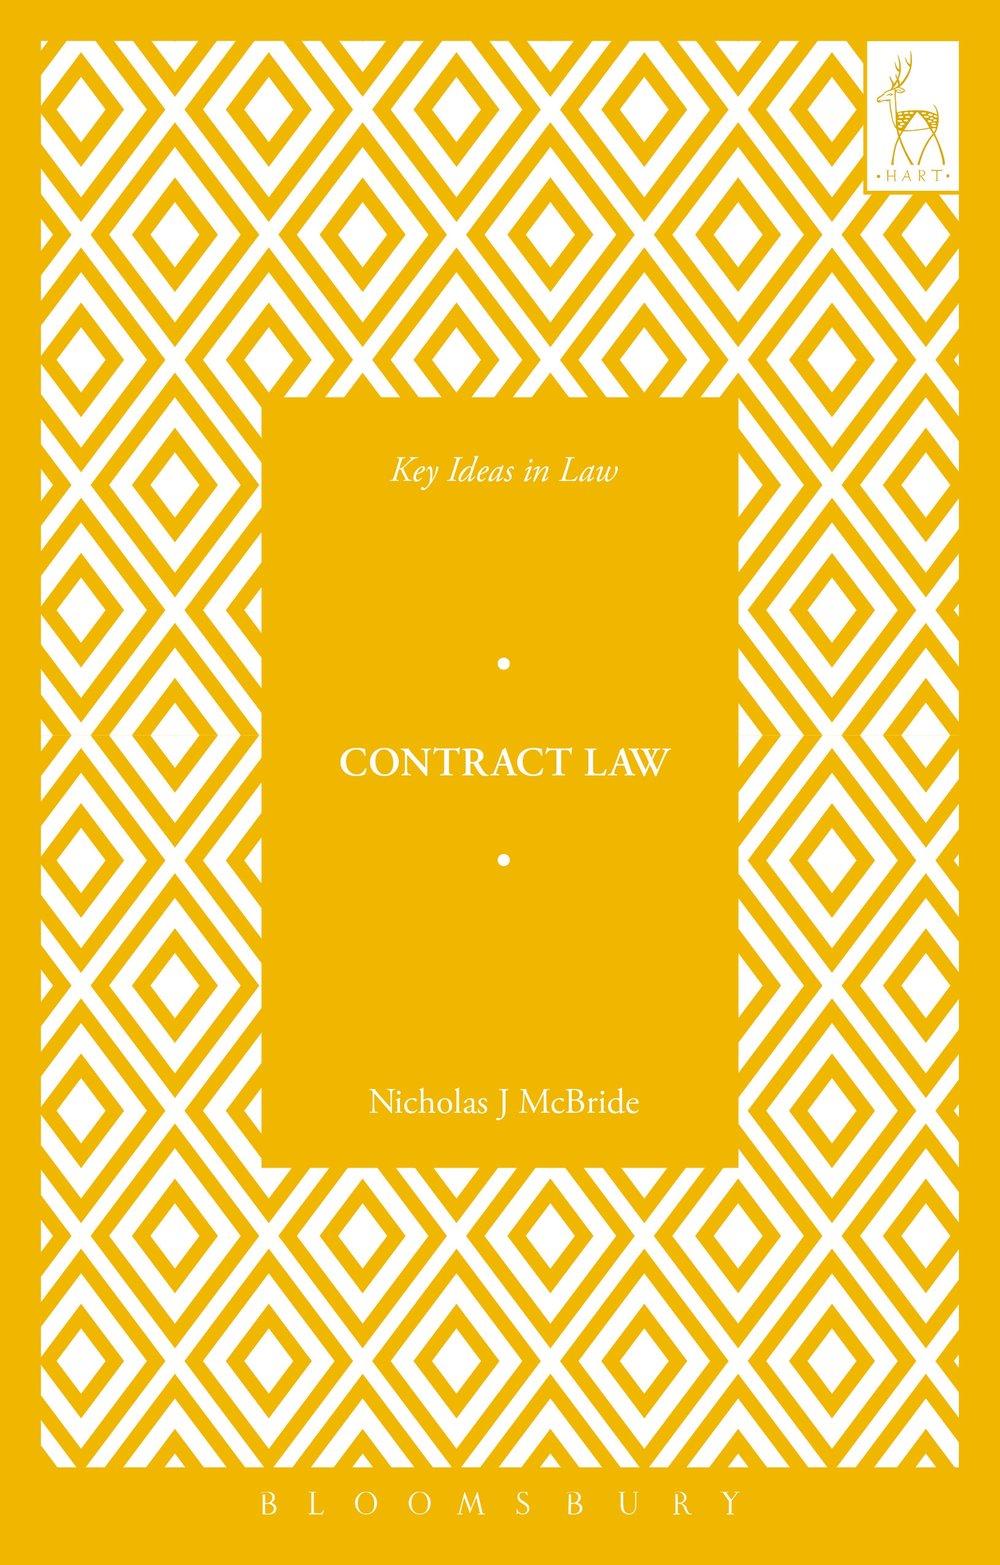 Key Ideas Contract 9781509907212.jpg